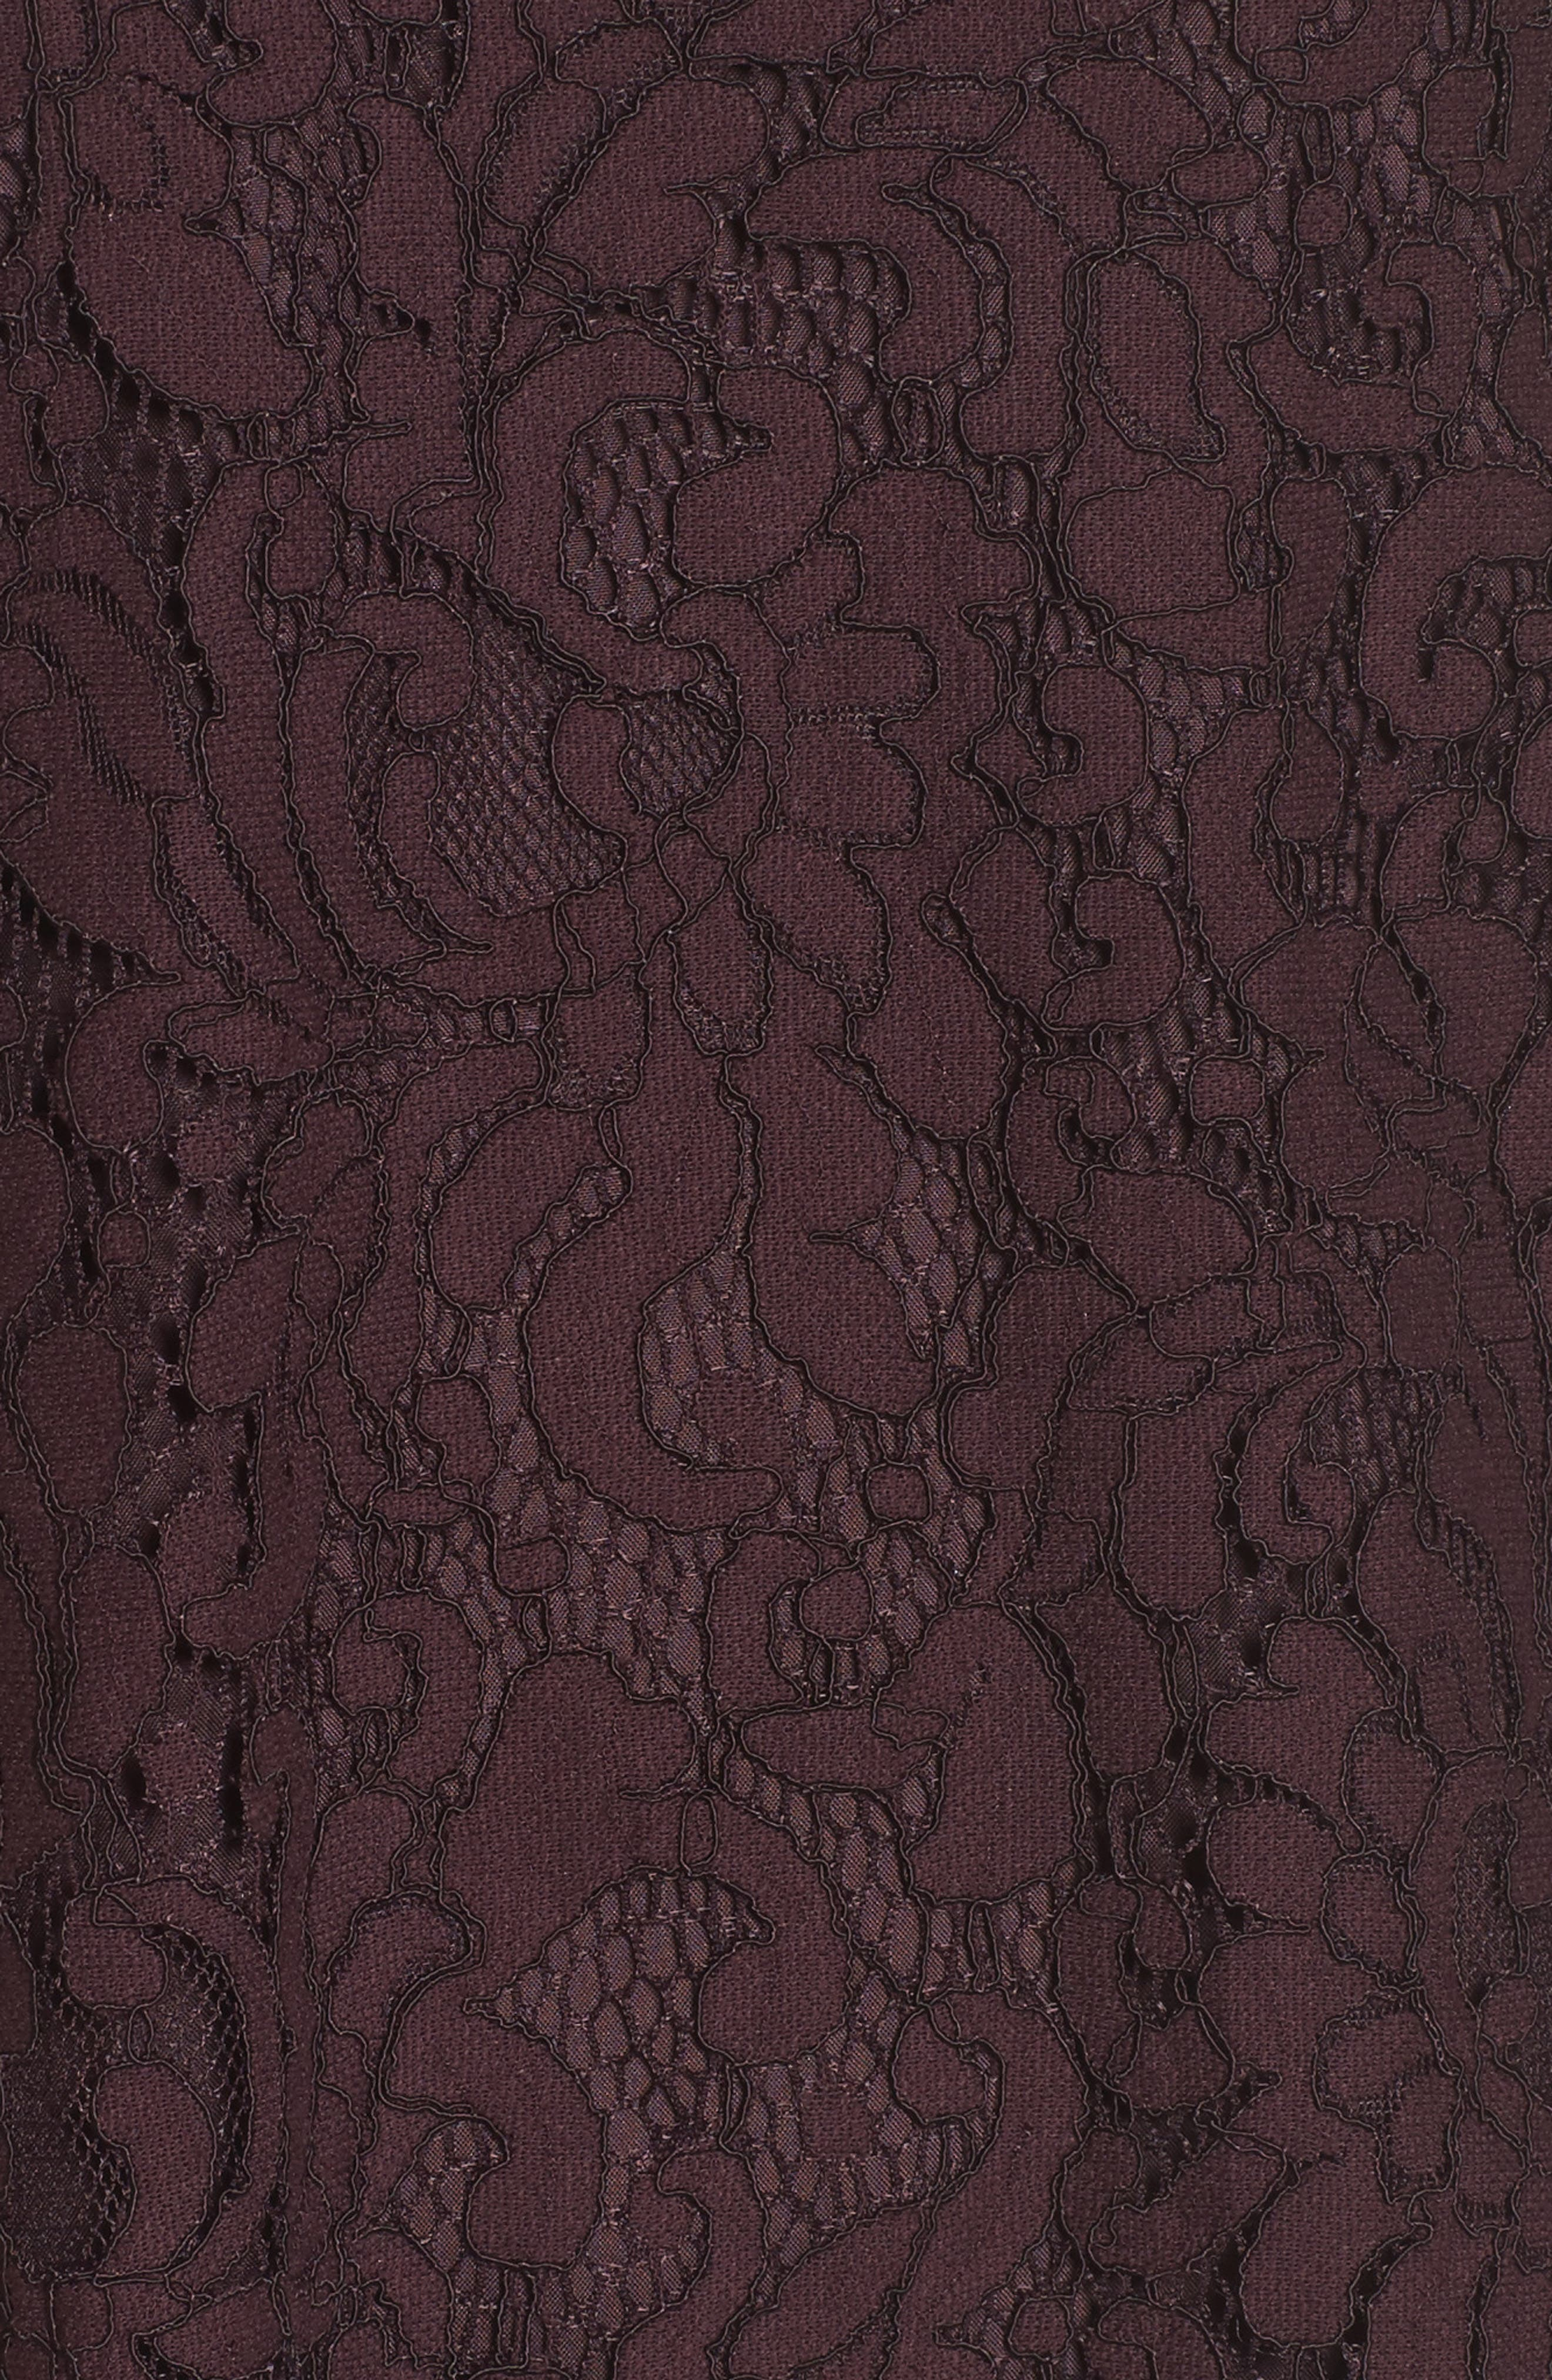 Adalira Off the Shoulder Lace Dress,                             Alternate thumbnail 5, color,                             930